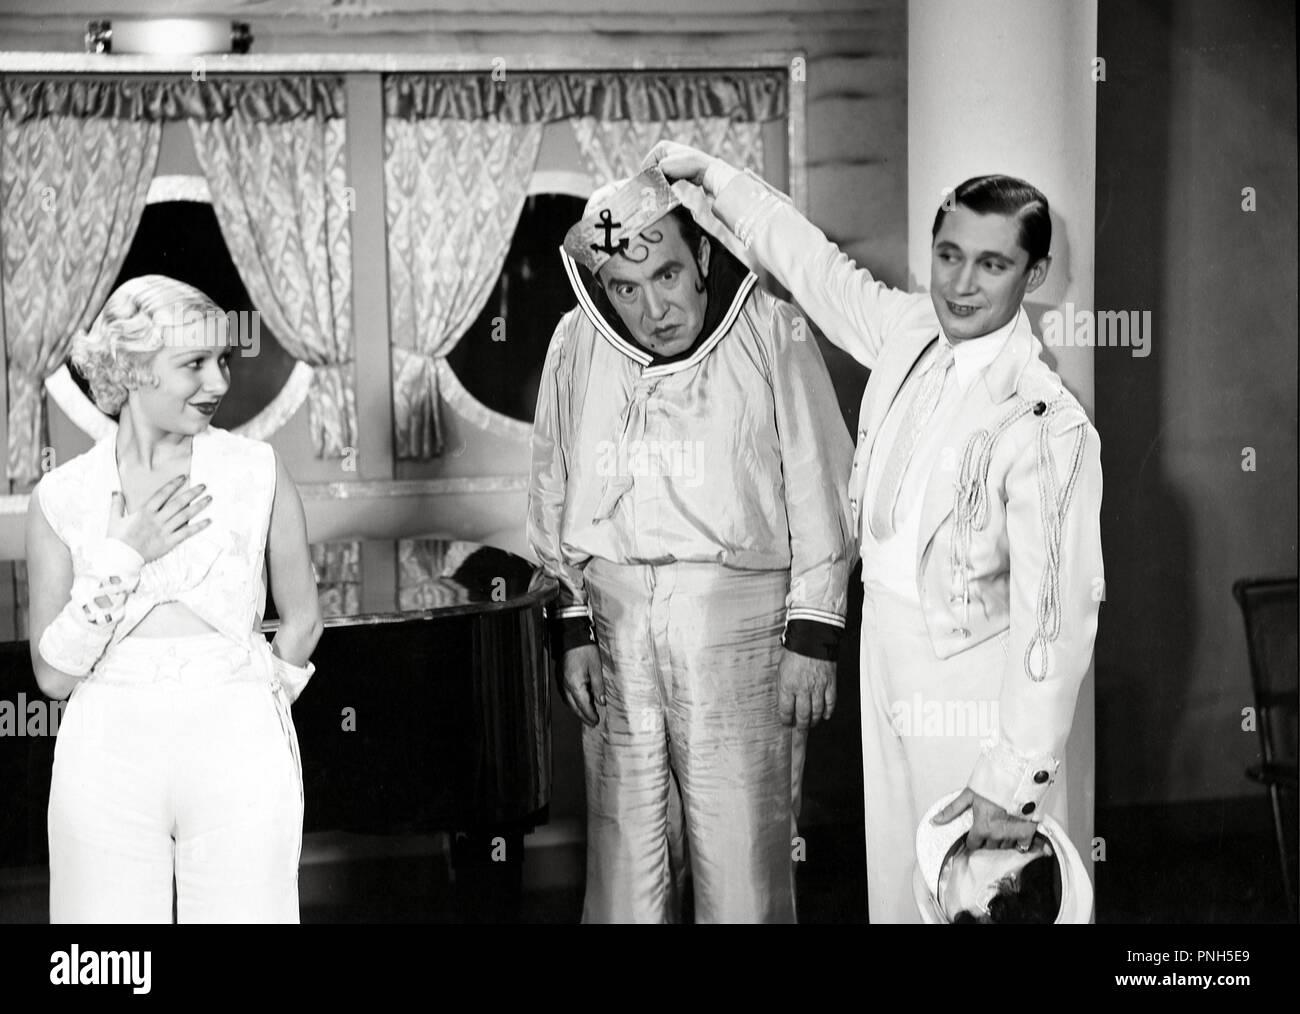 Original film title: ABAJO LOS HOMBRES. English title: ABAJO LOS HOMBRES. Year: 1936. Director: JOSE MARIA CASTELLVI. Stars: CARMELITA AUBERT; ALEJANDRO NOLLA; PIERRE CLAREL. Credit: EDICI / Album - Stock Image